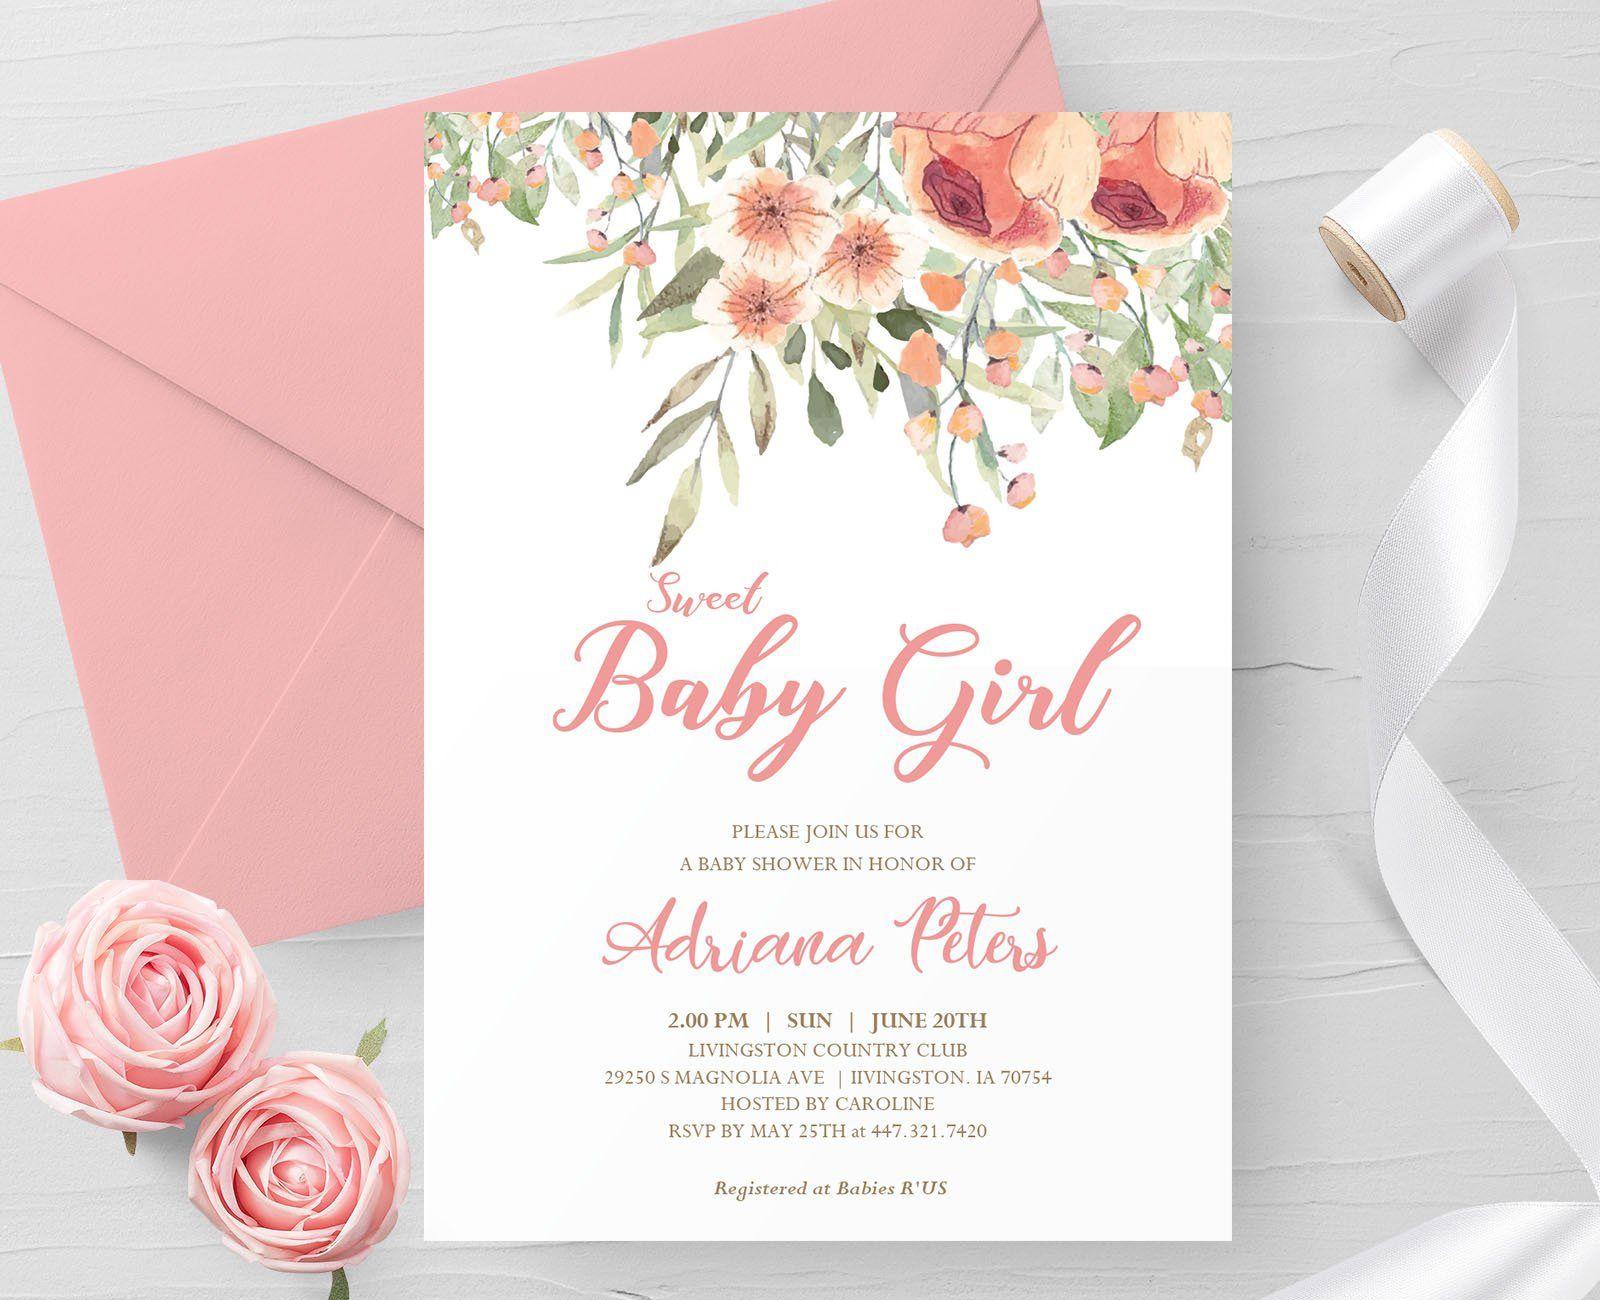 000 Staggering Free Baby Shower Invitation Template Editable High Def  Digital Microsoft WordFull